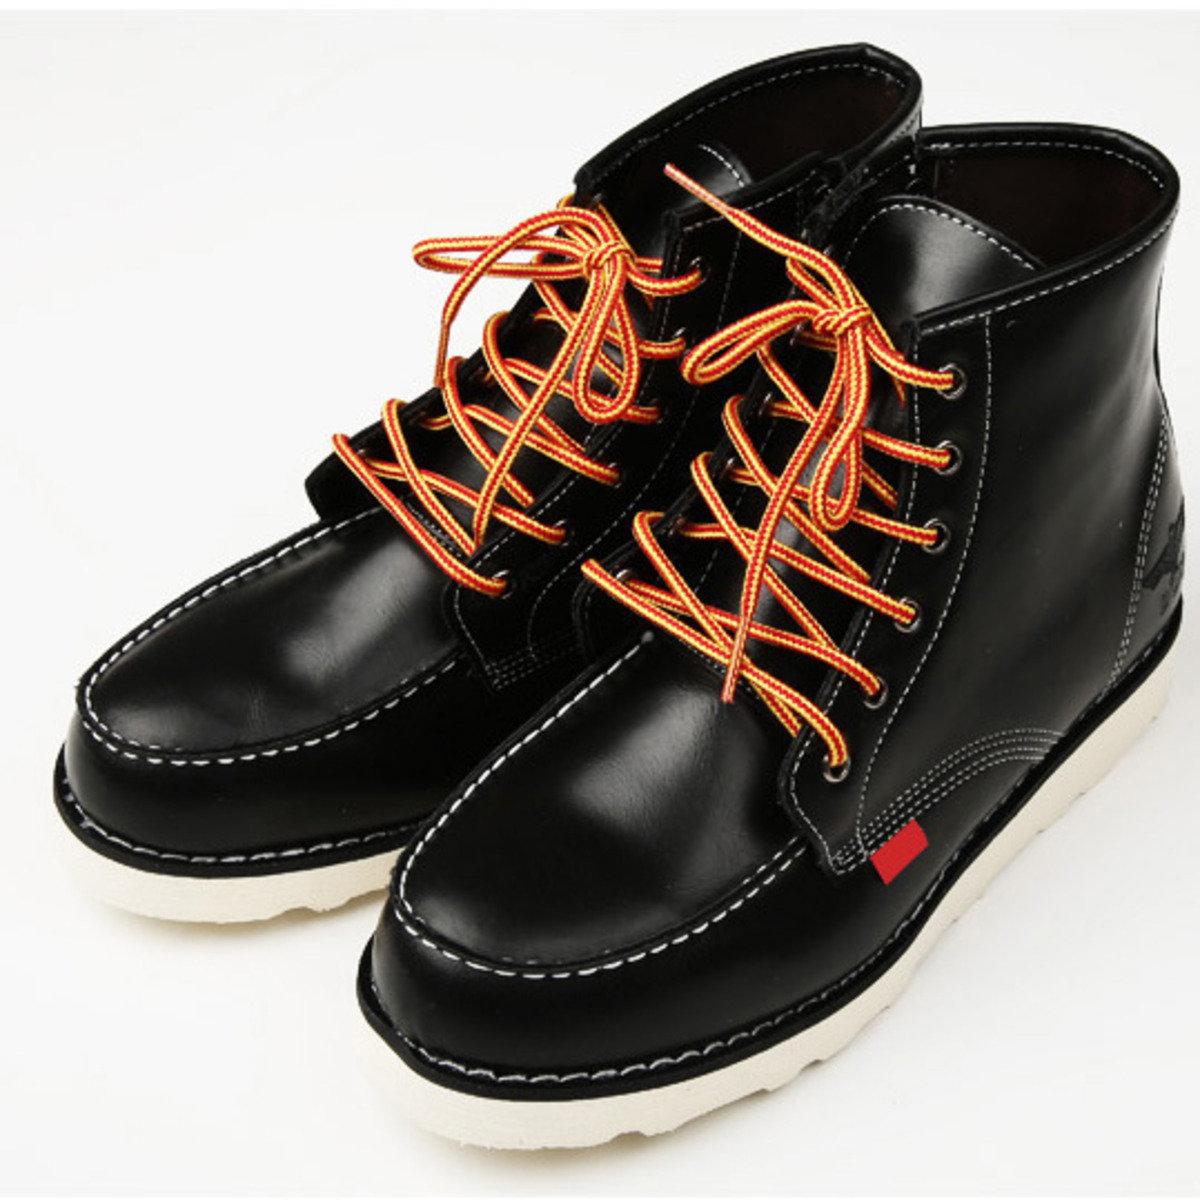 Mokto綁帶靴子_SH6_160113654